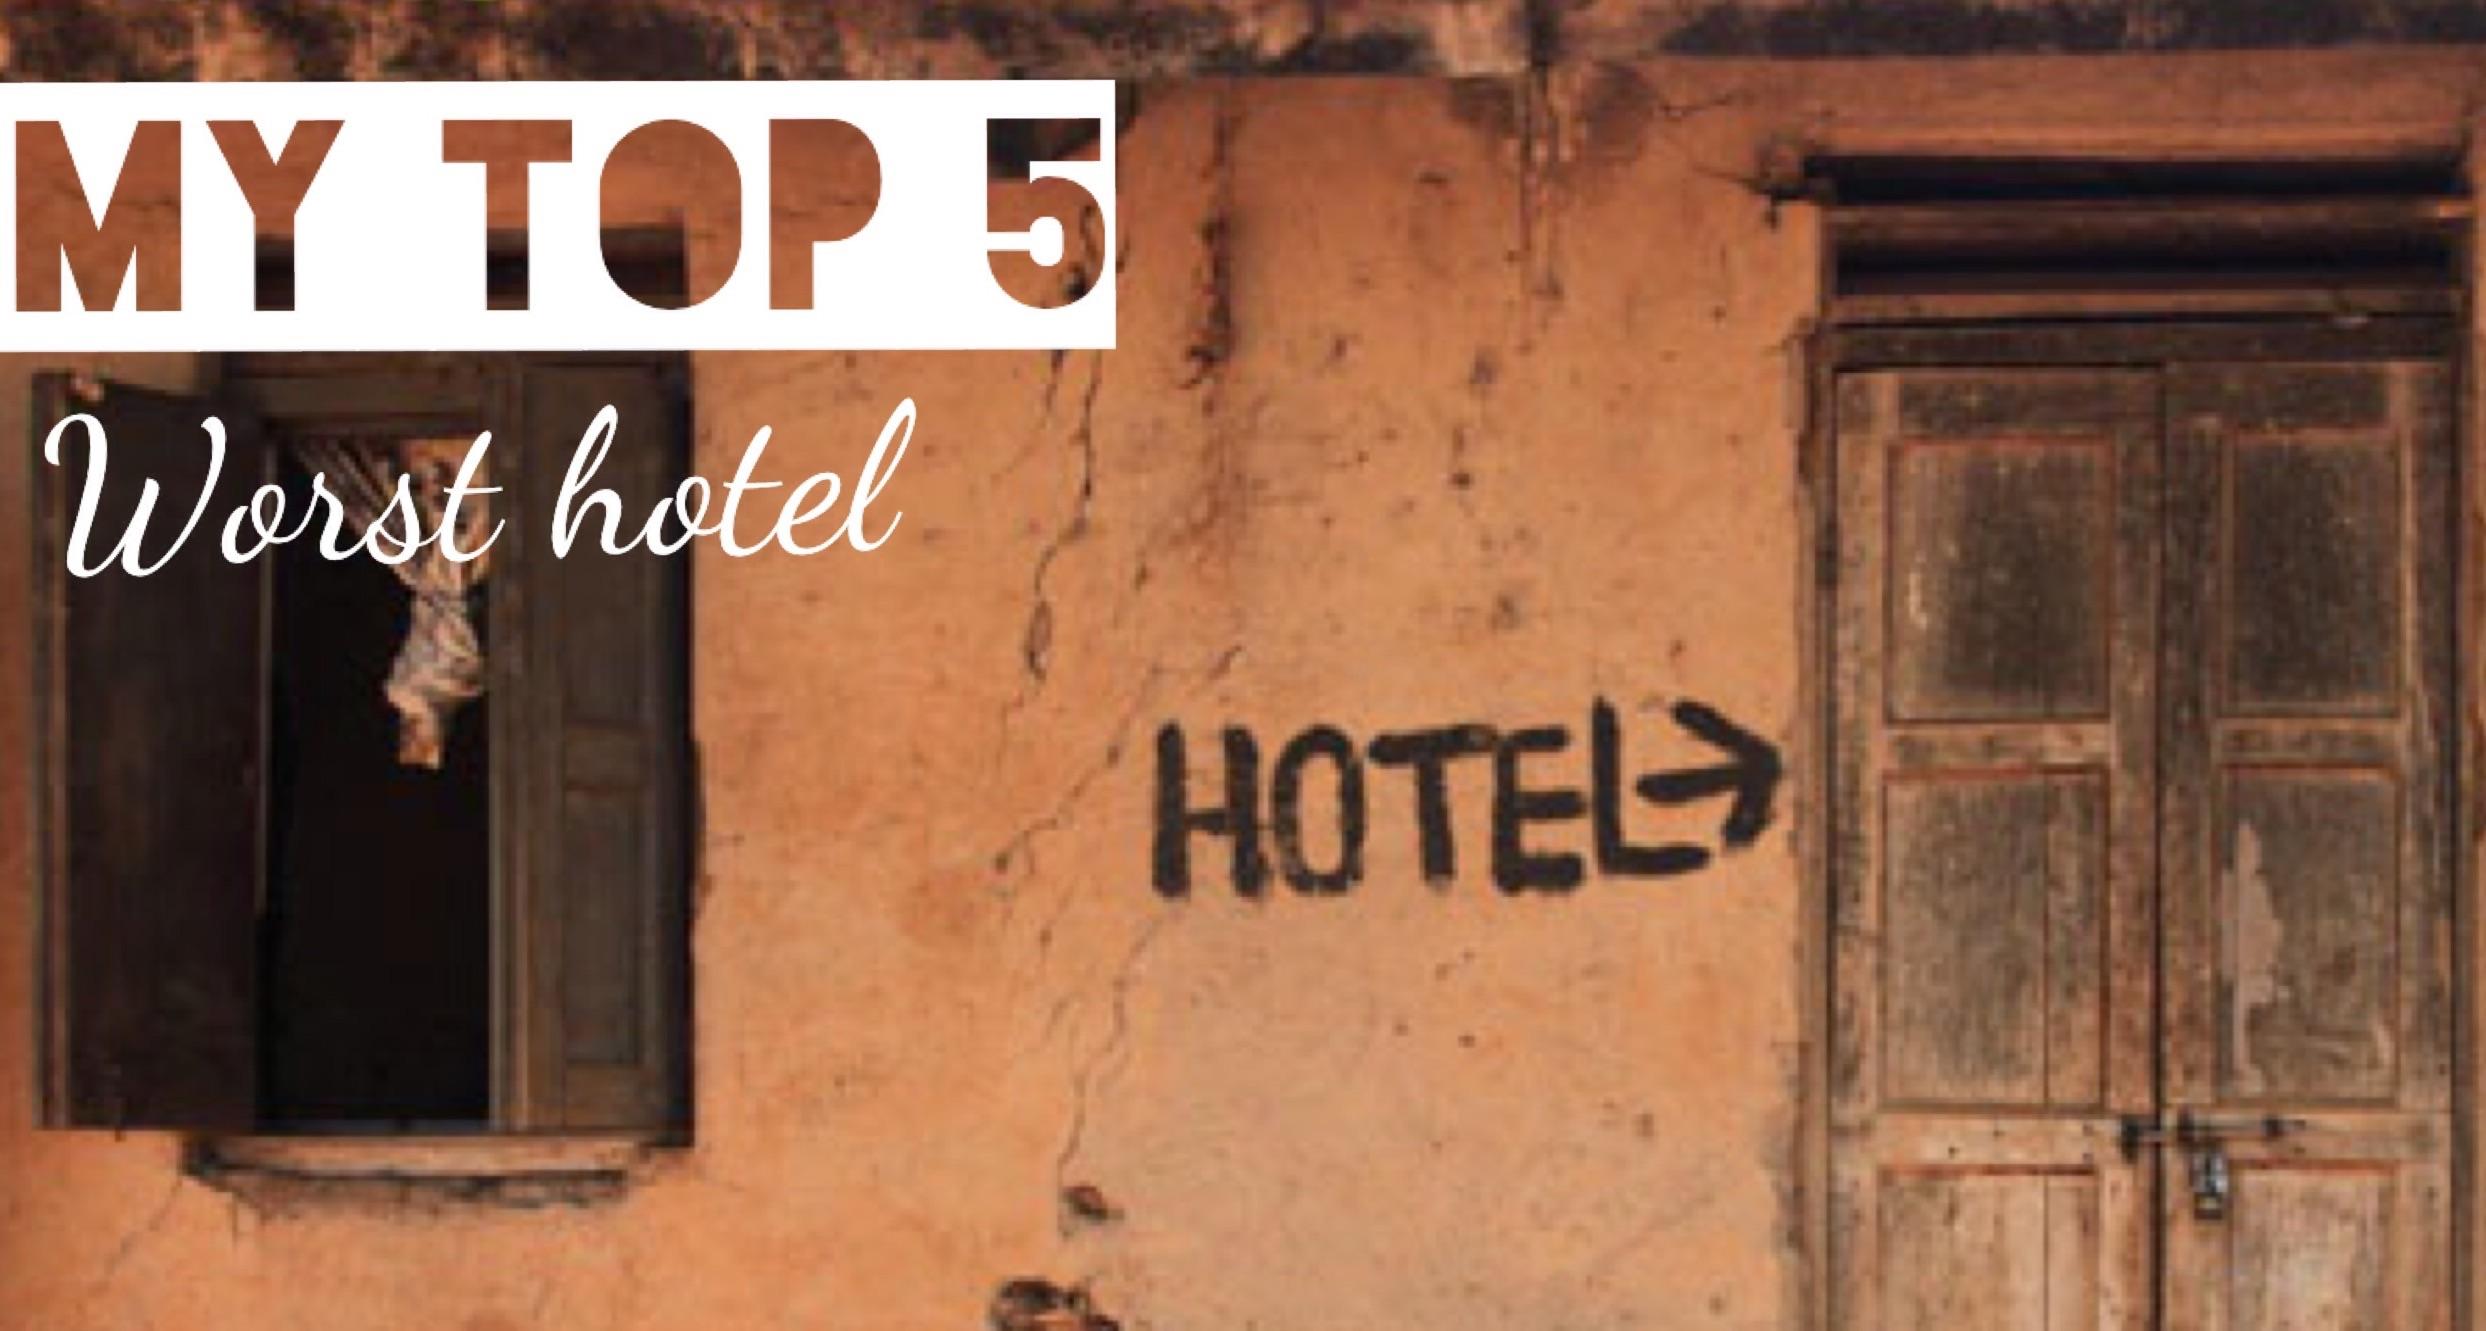 My top 5 worst hotel